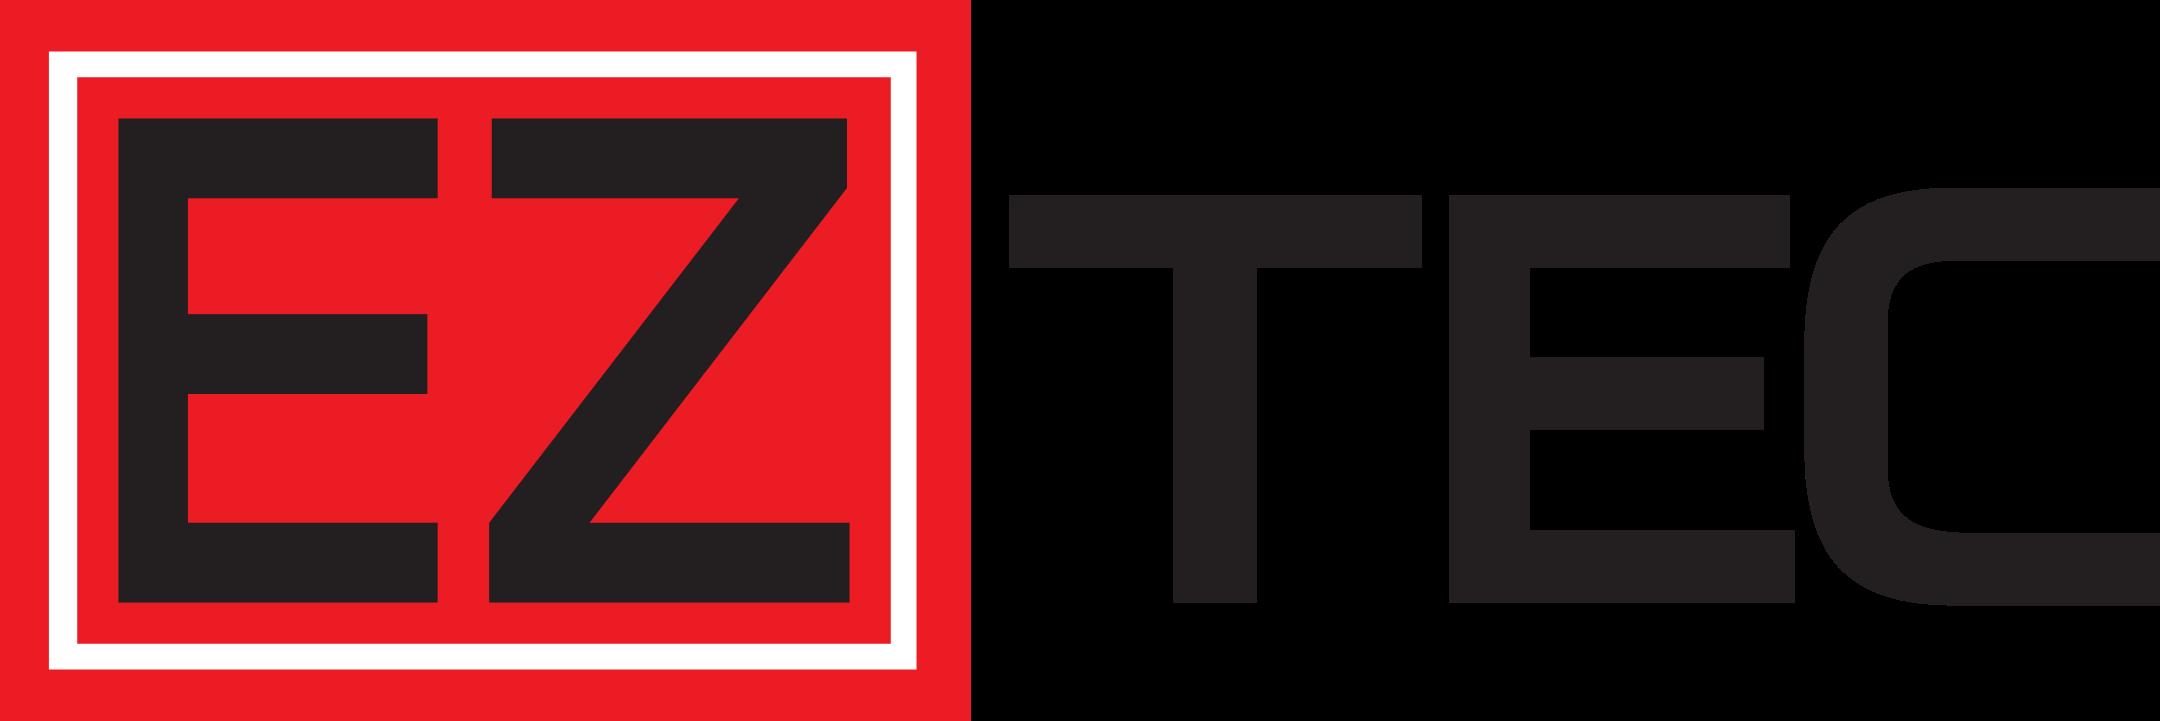 eztec logo 1 - Eztec Logo